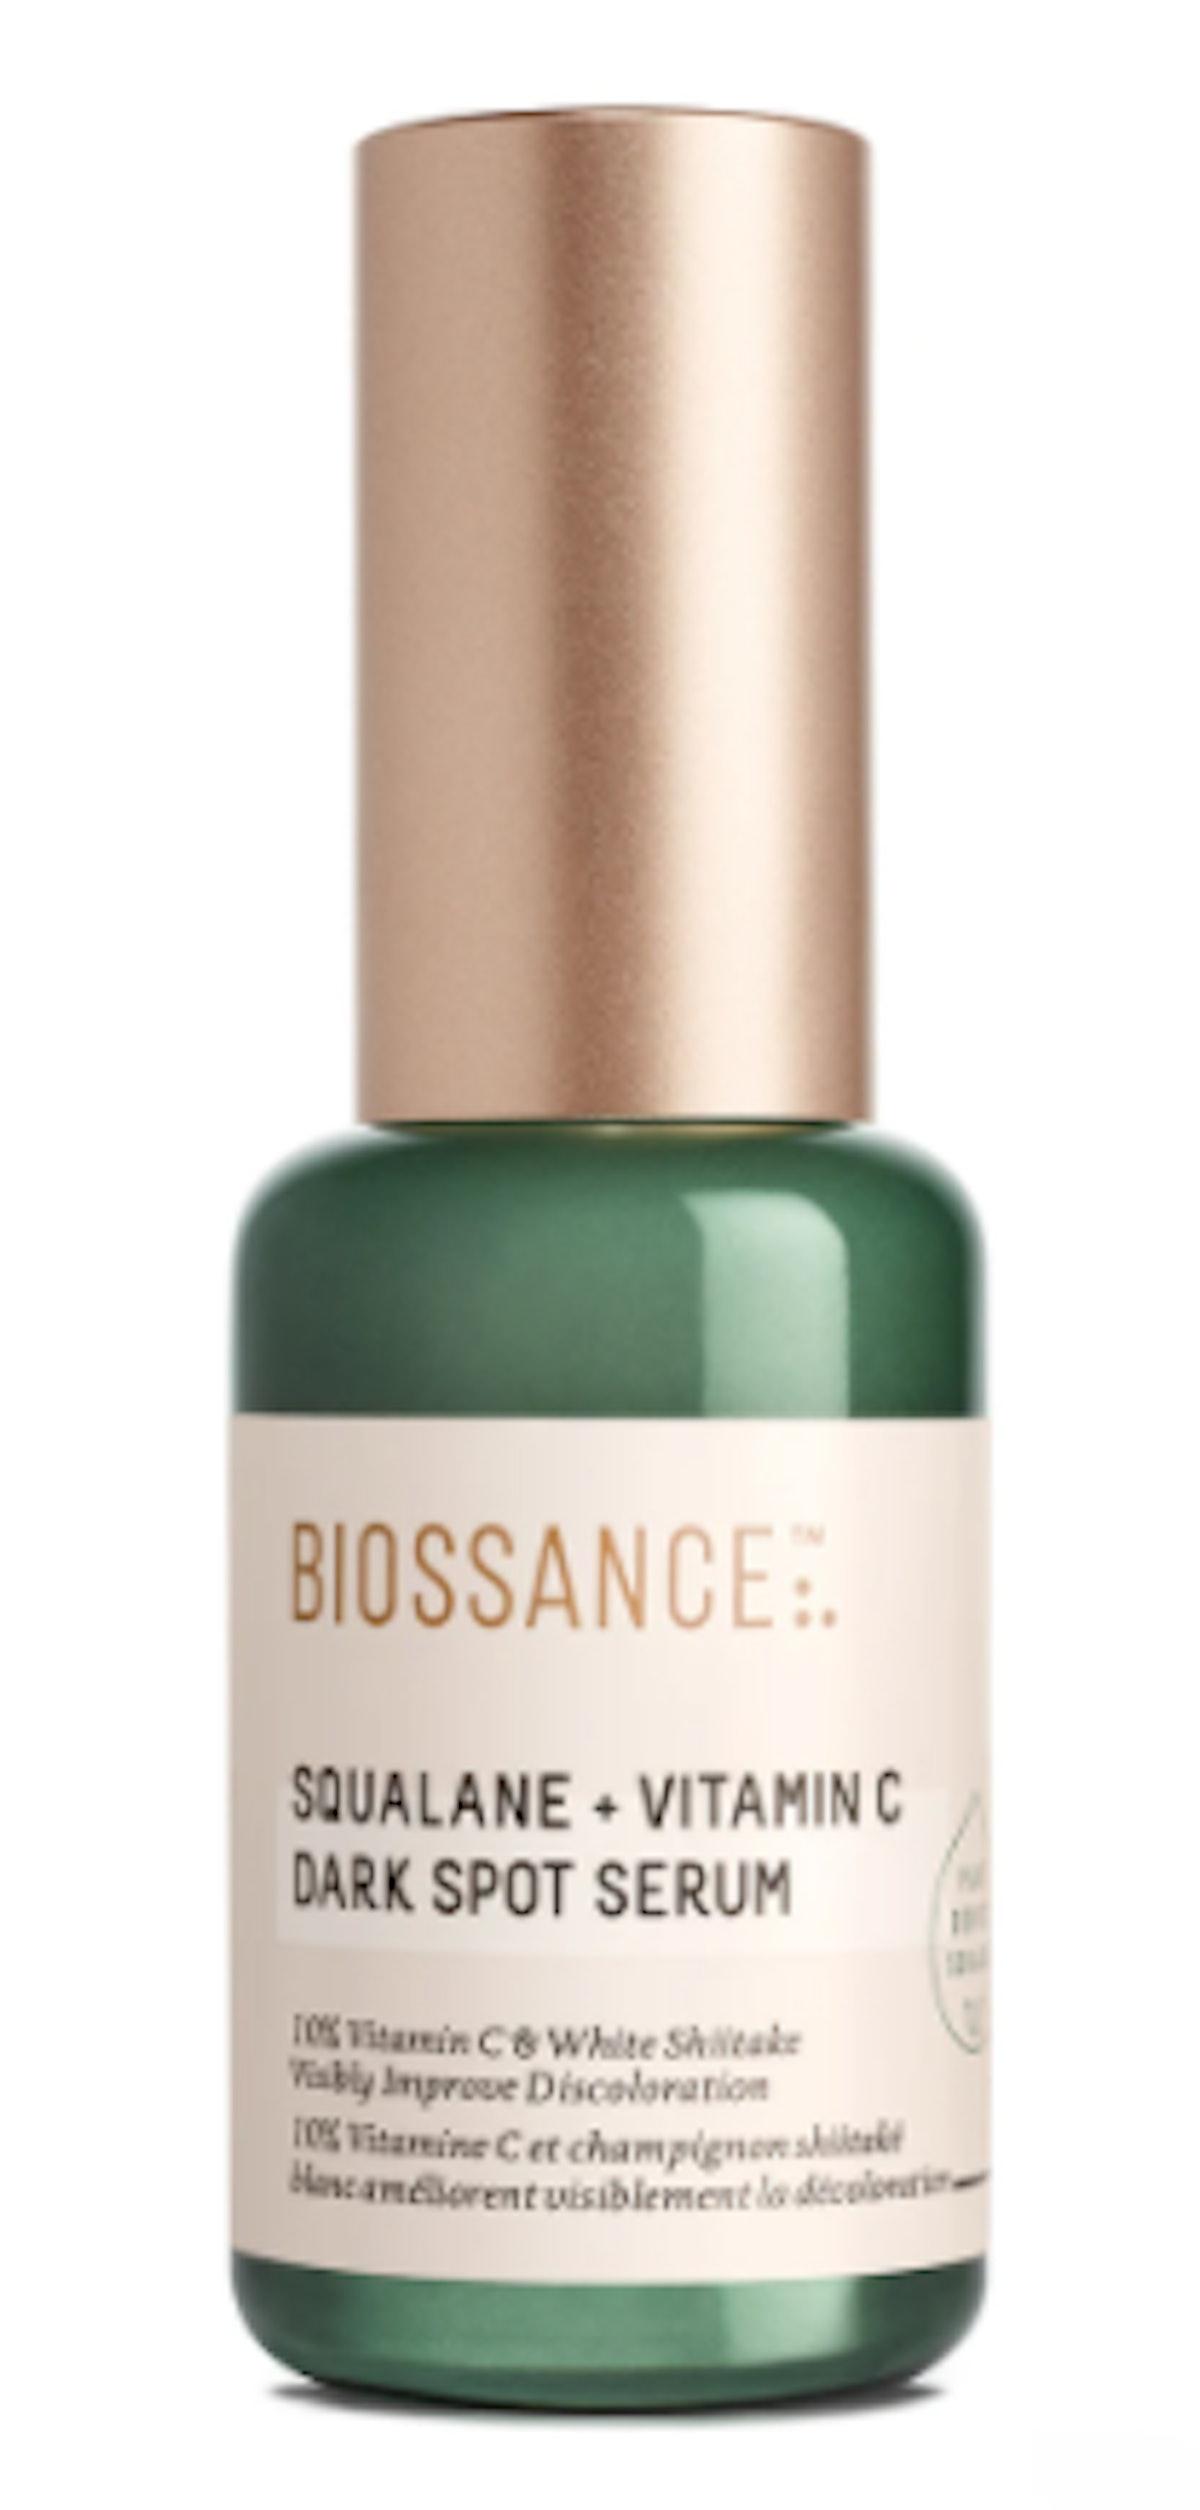 Squalane + Vitamin C Dark Spot Serum